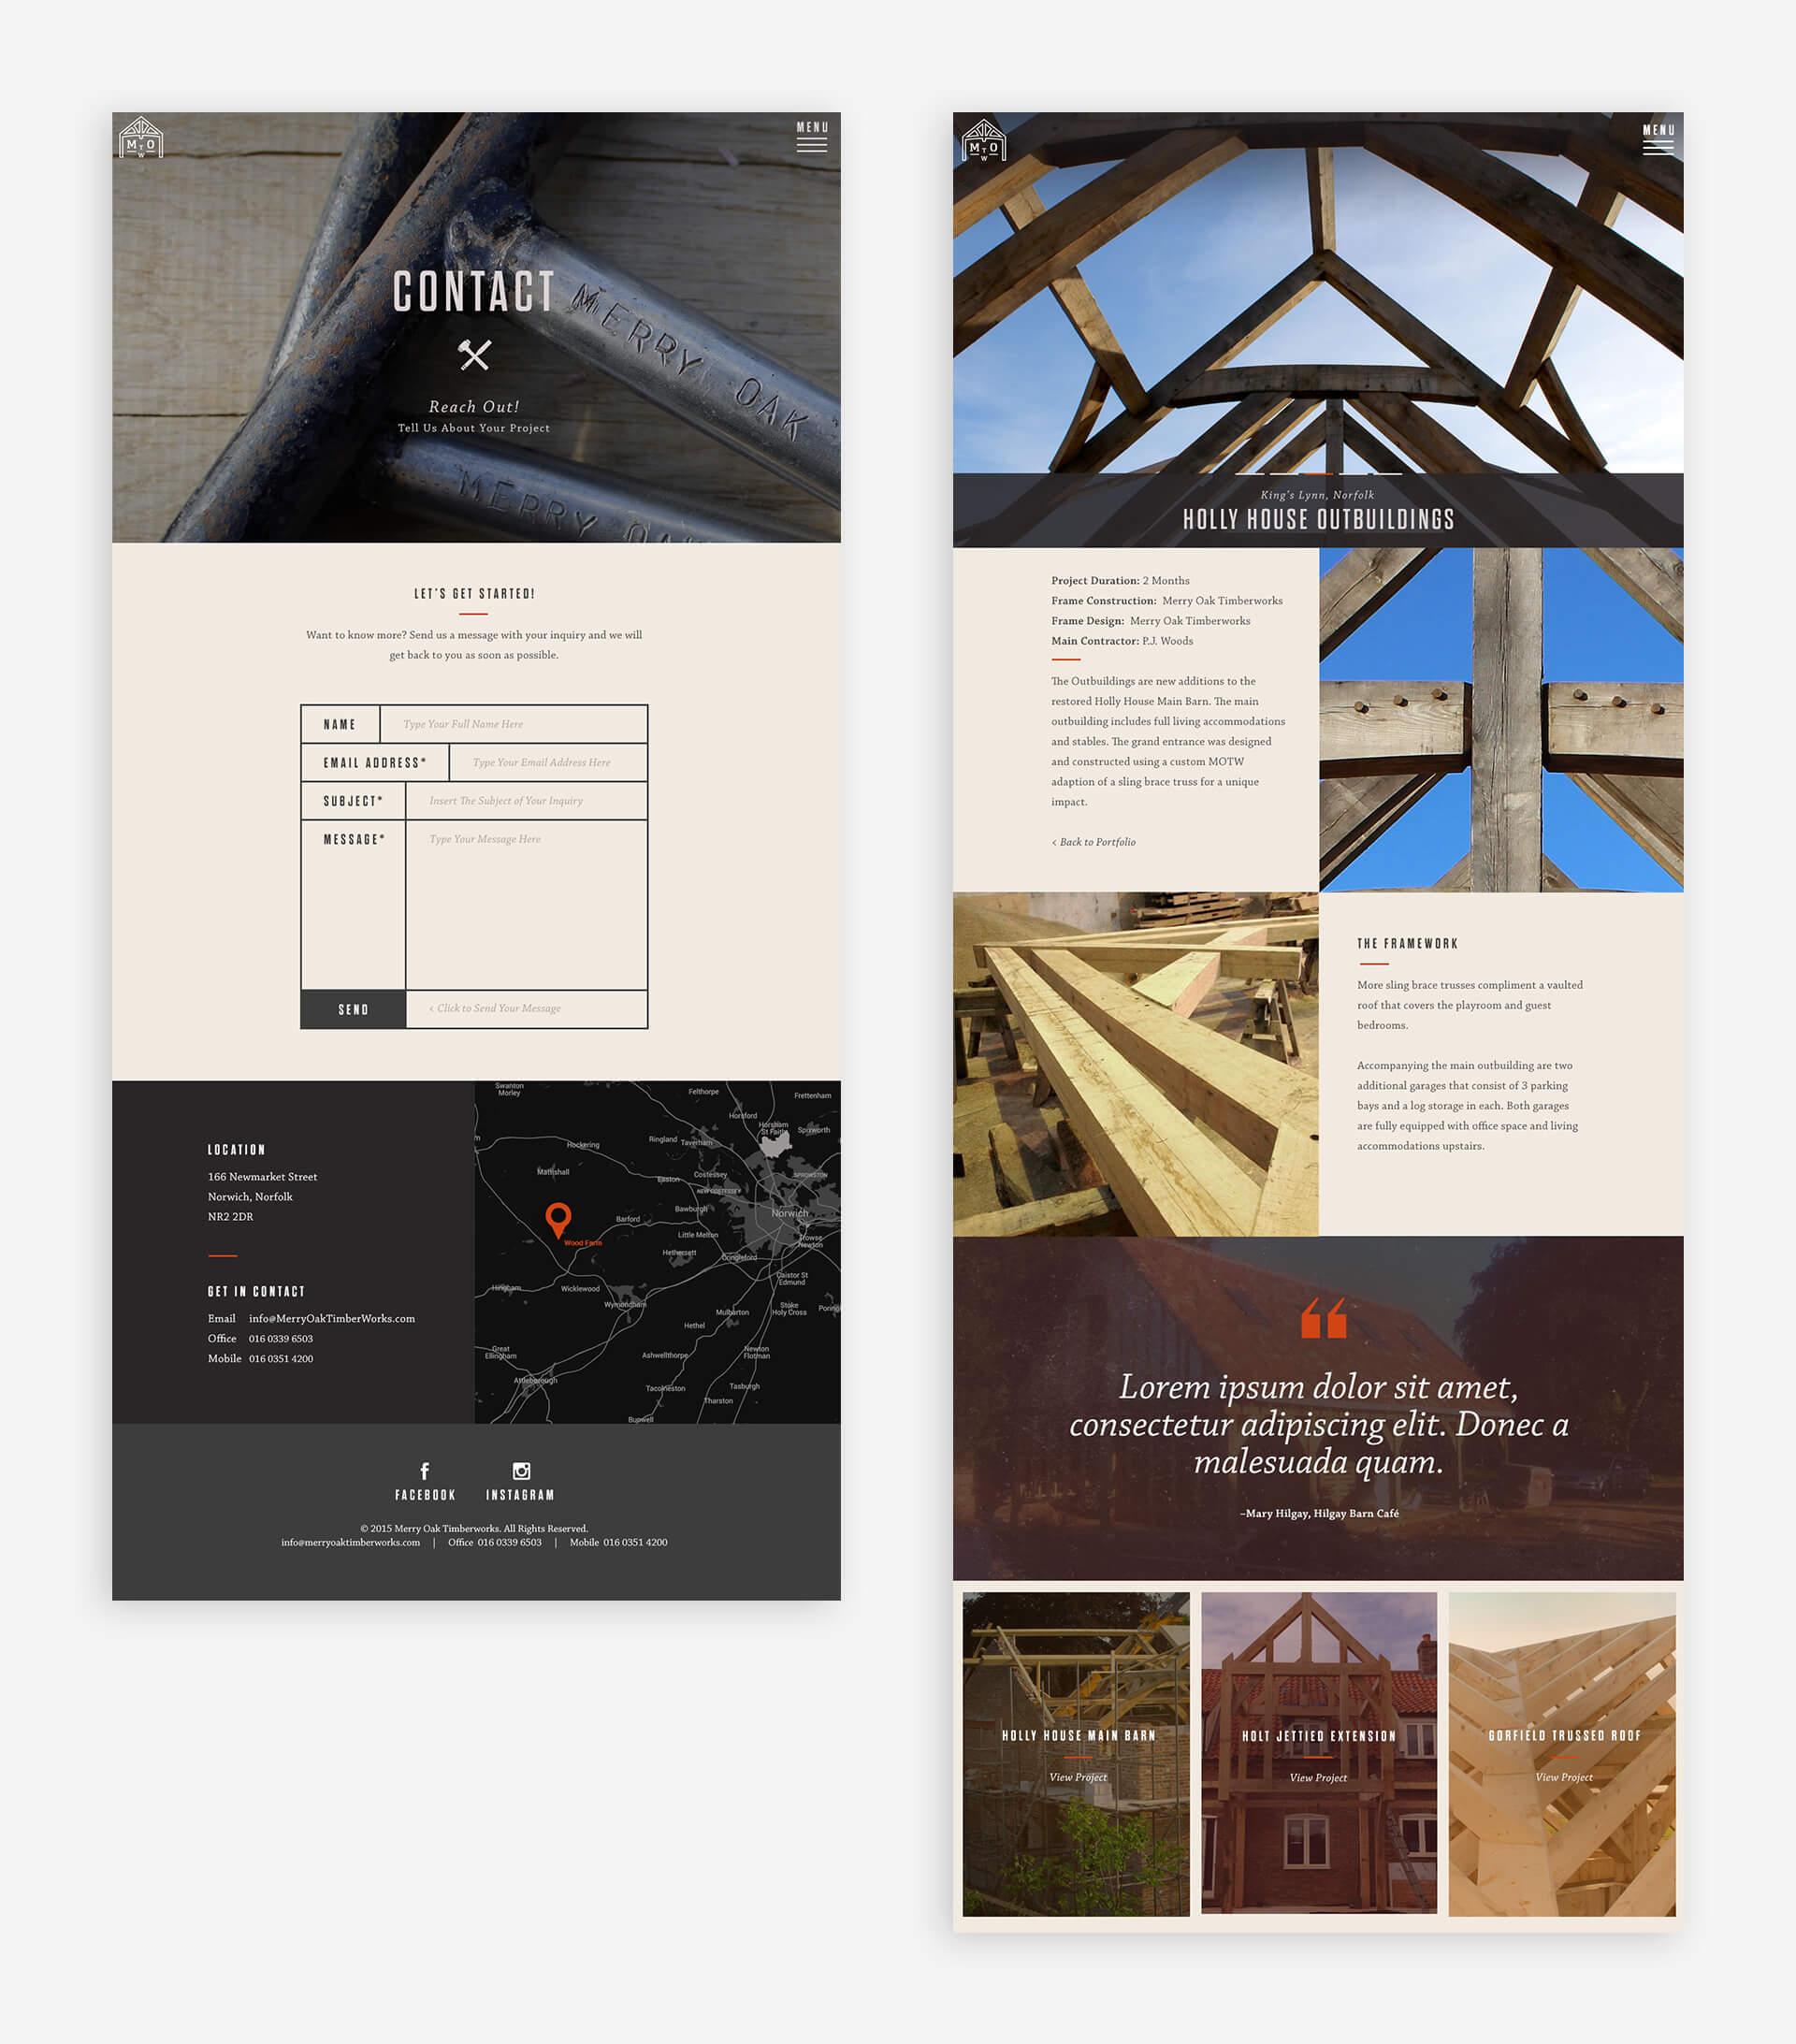 Merry Oak Timberworks web page design by Nicole Hammonds